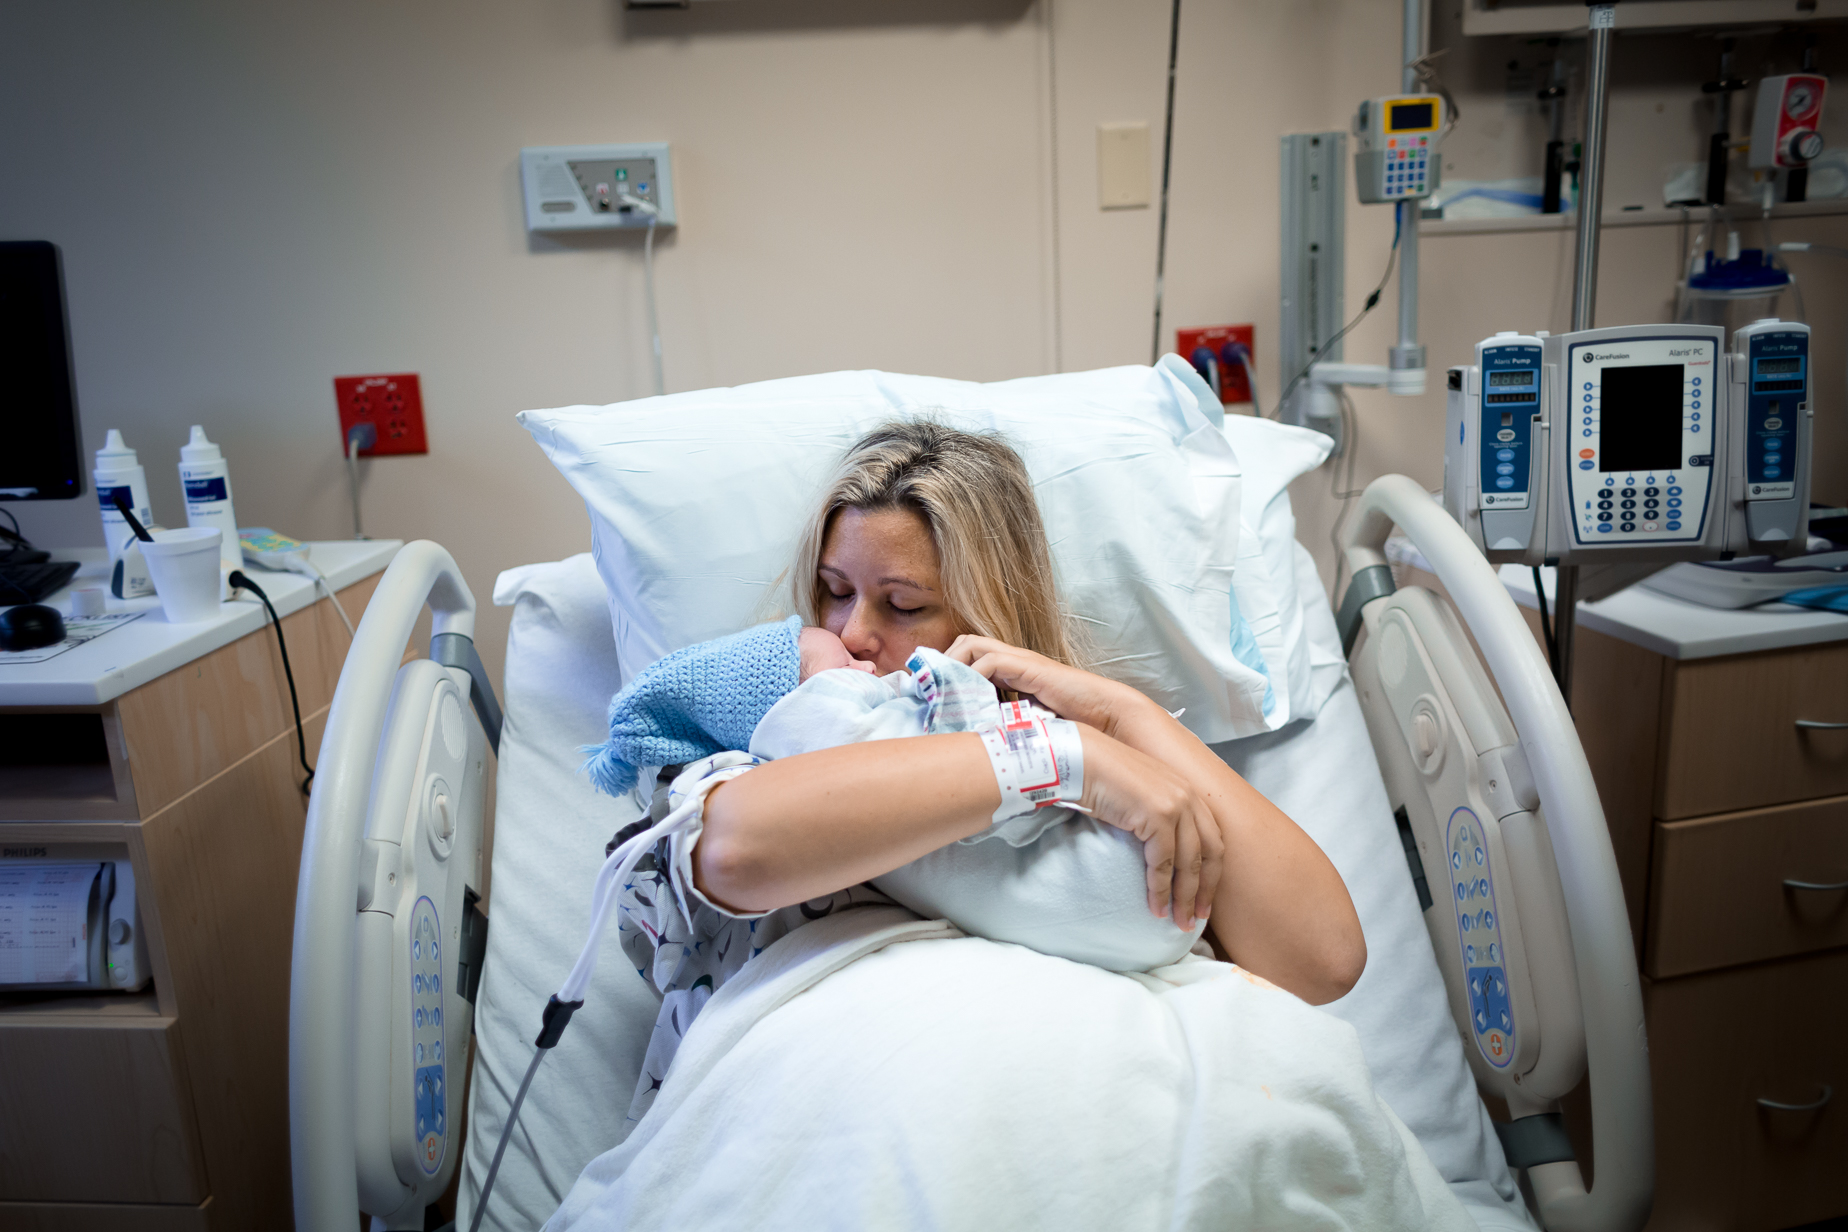 west-boca-hospital-gentle-c-section-epidural-vbac-home-birth-mary-harris-palms-birth-house-center-30.jpg